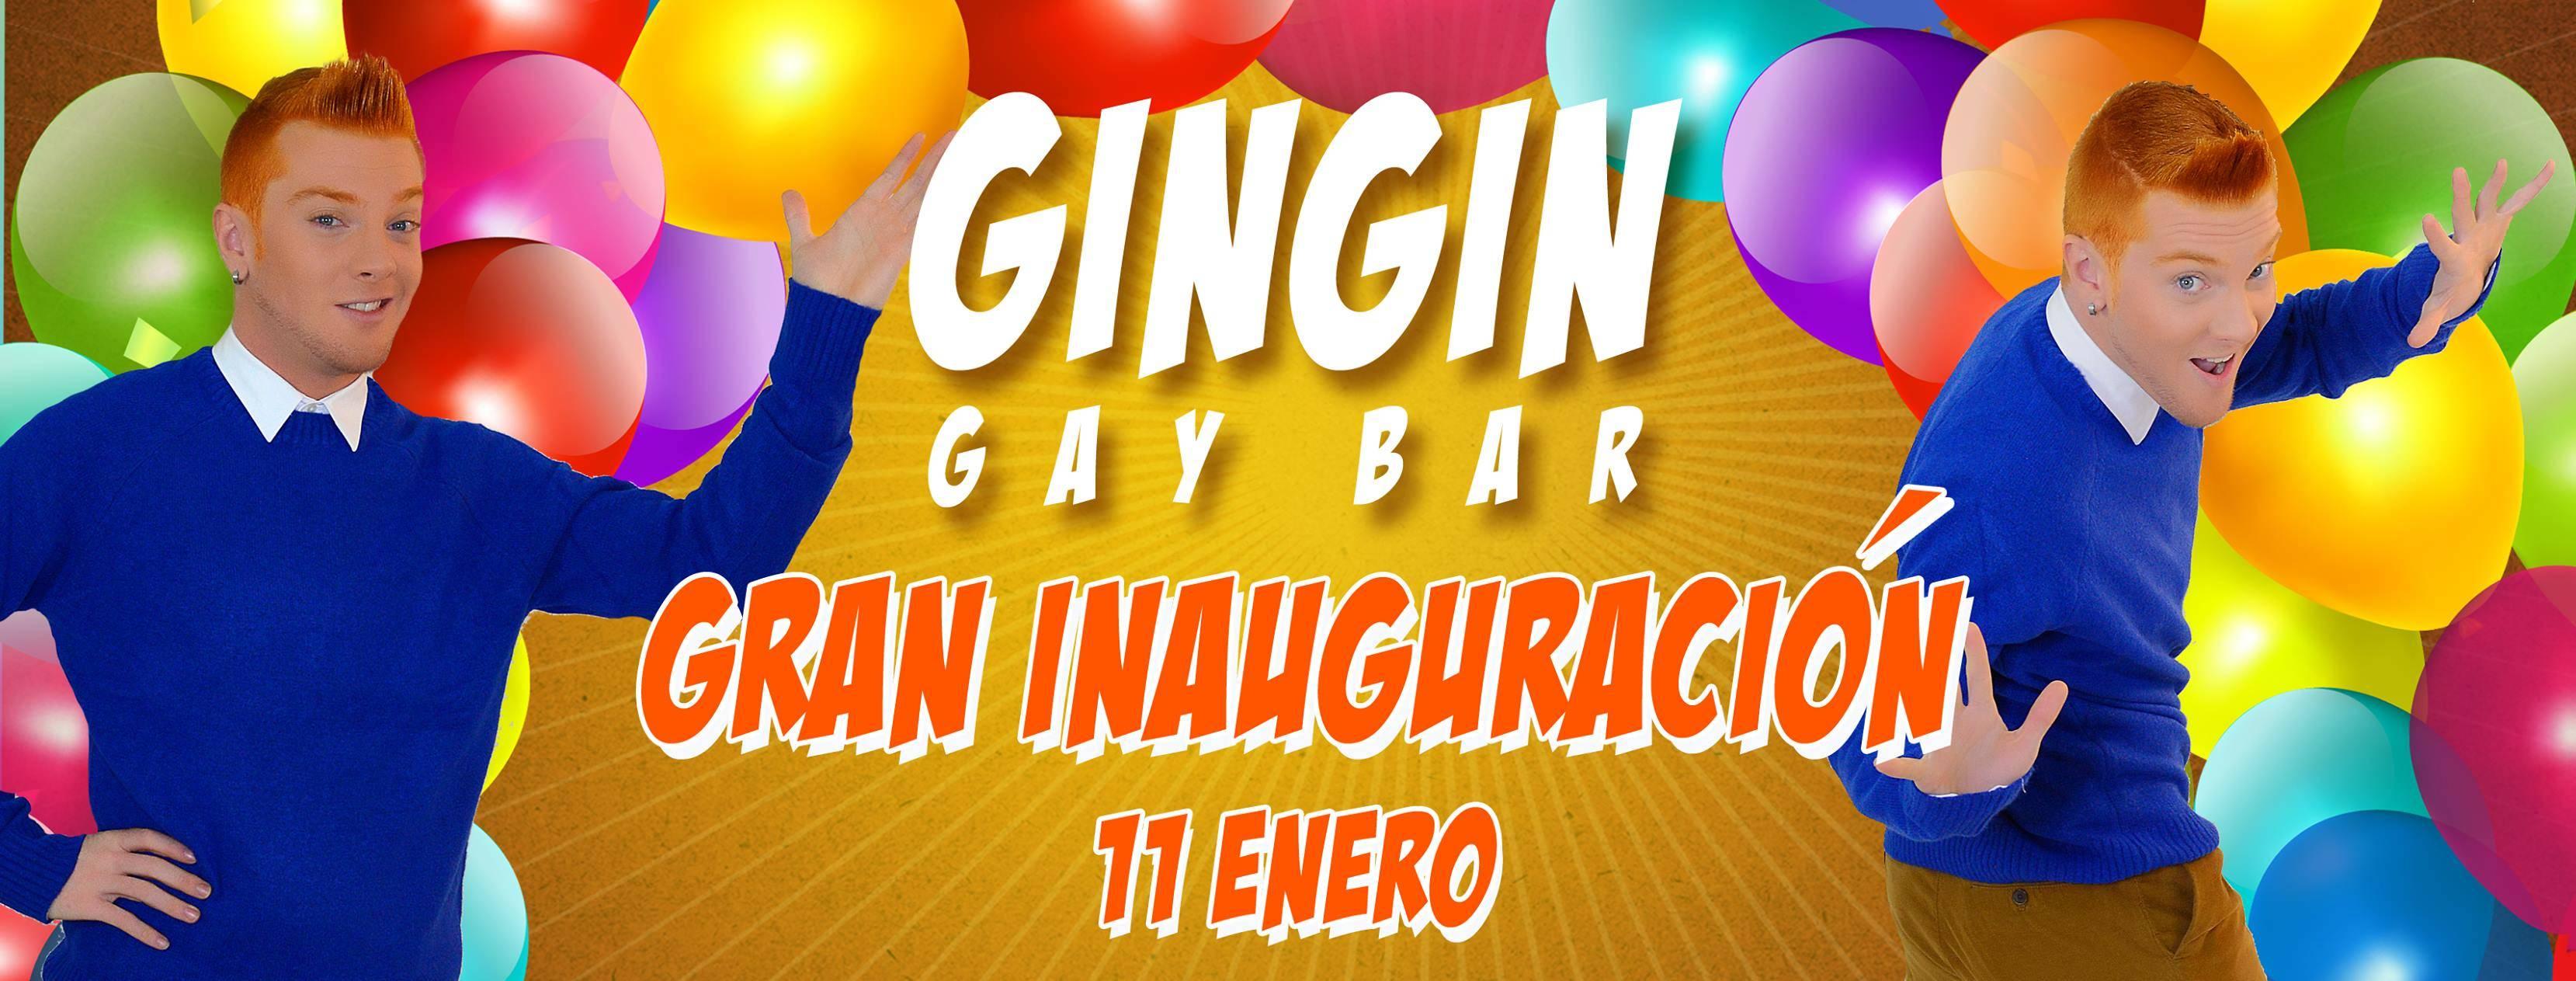 gingin-gay-bar-11.jpg